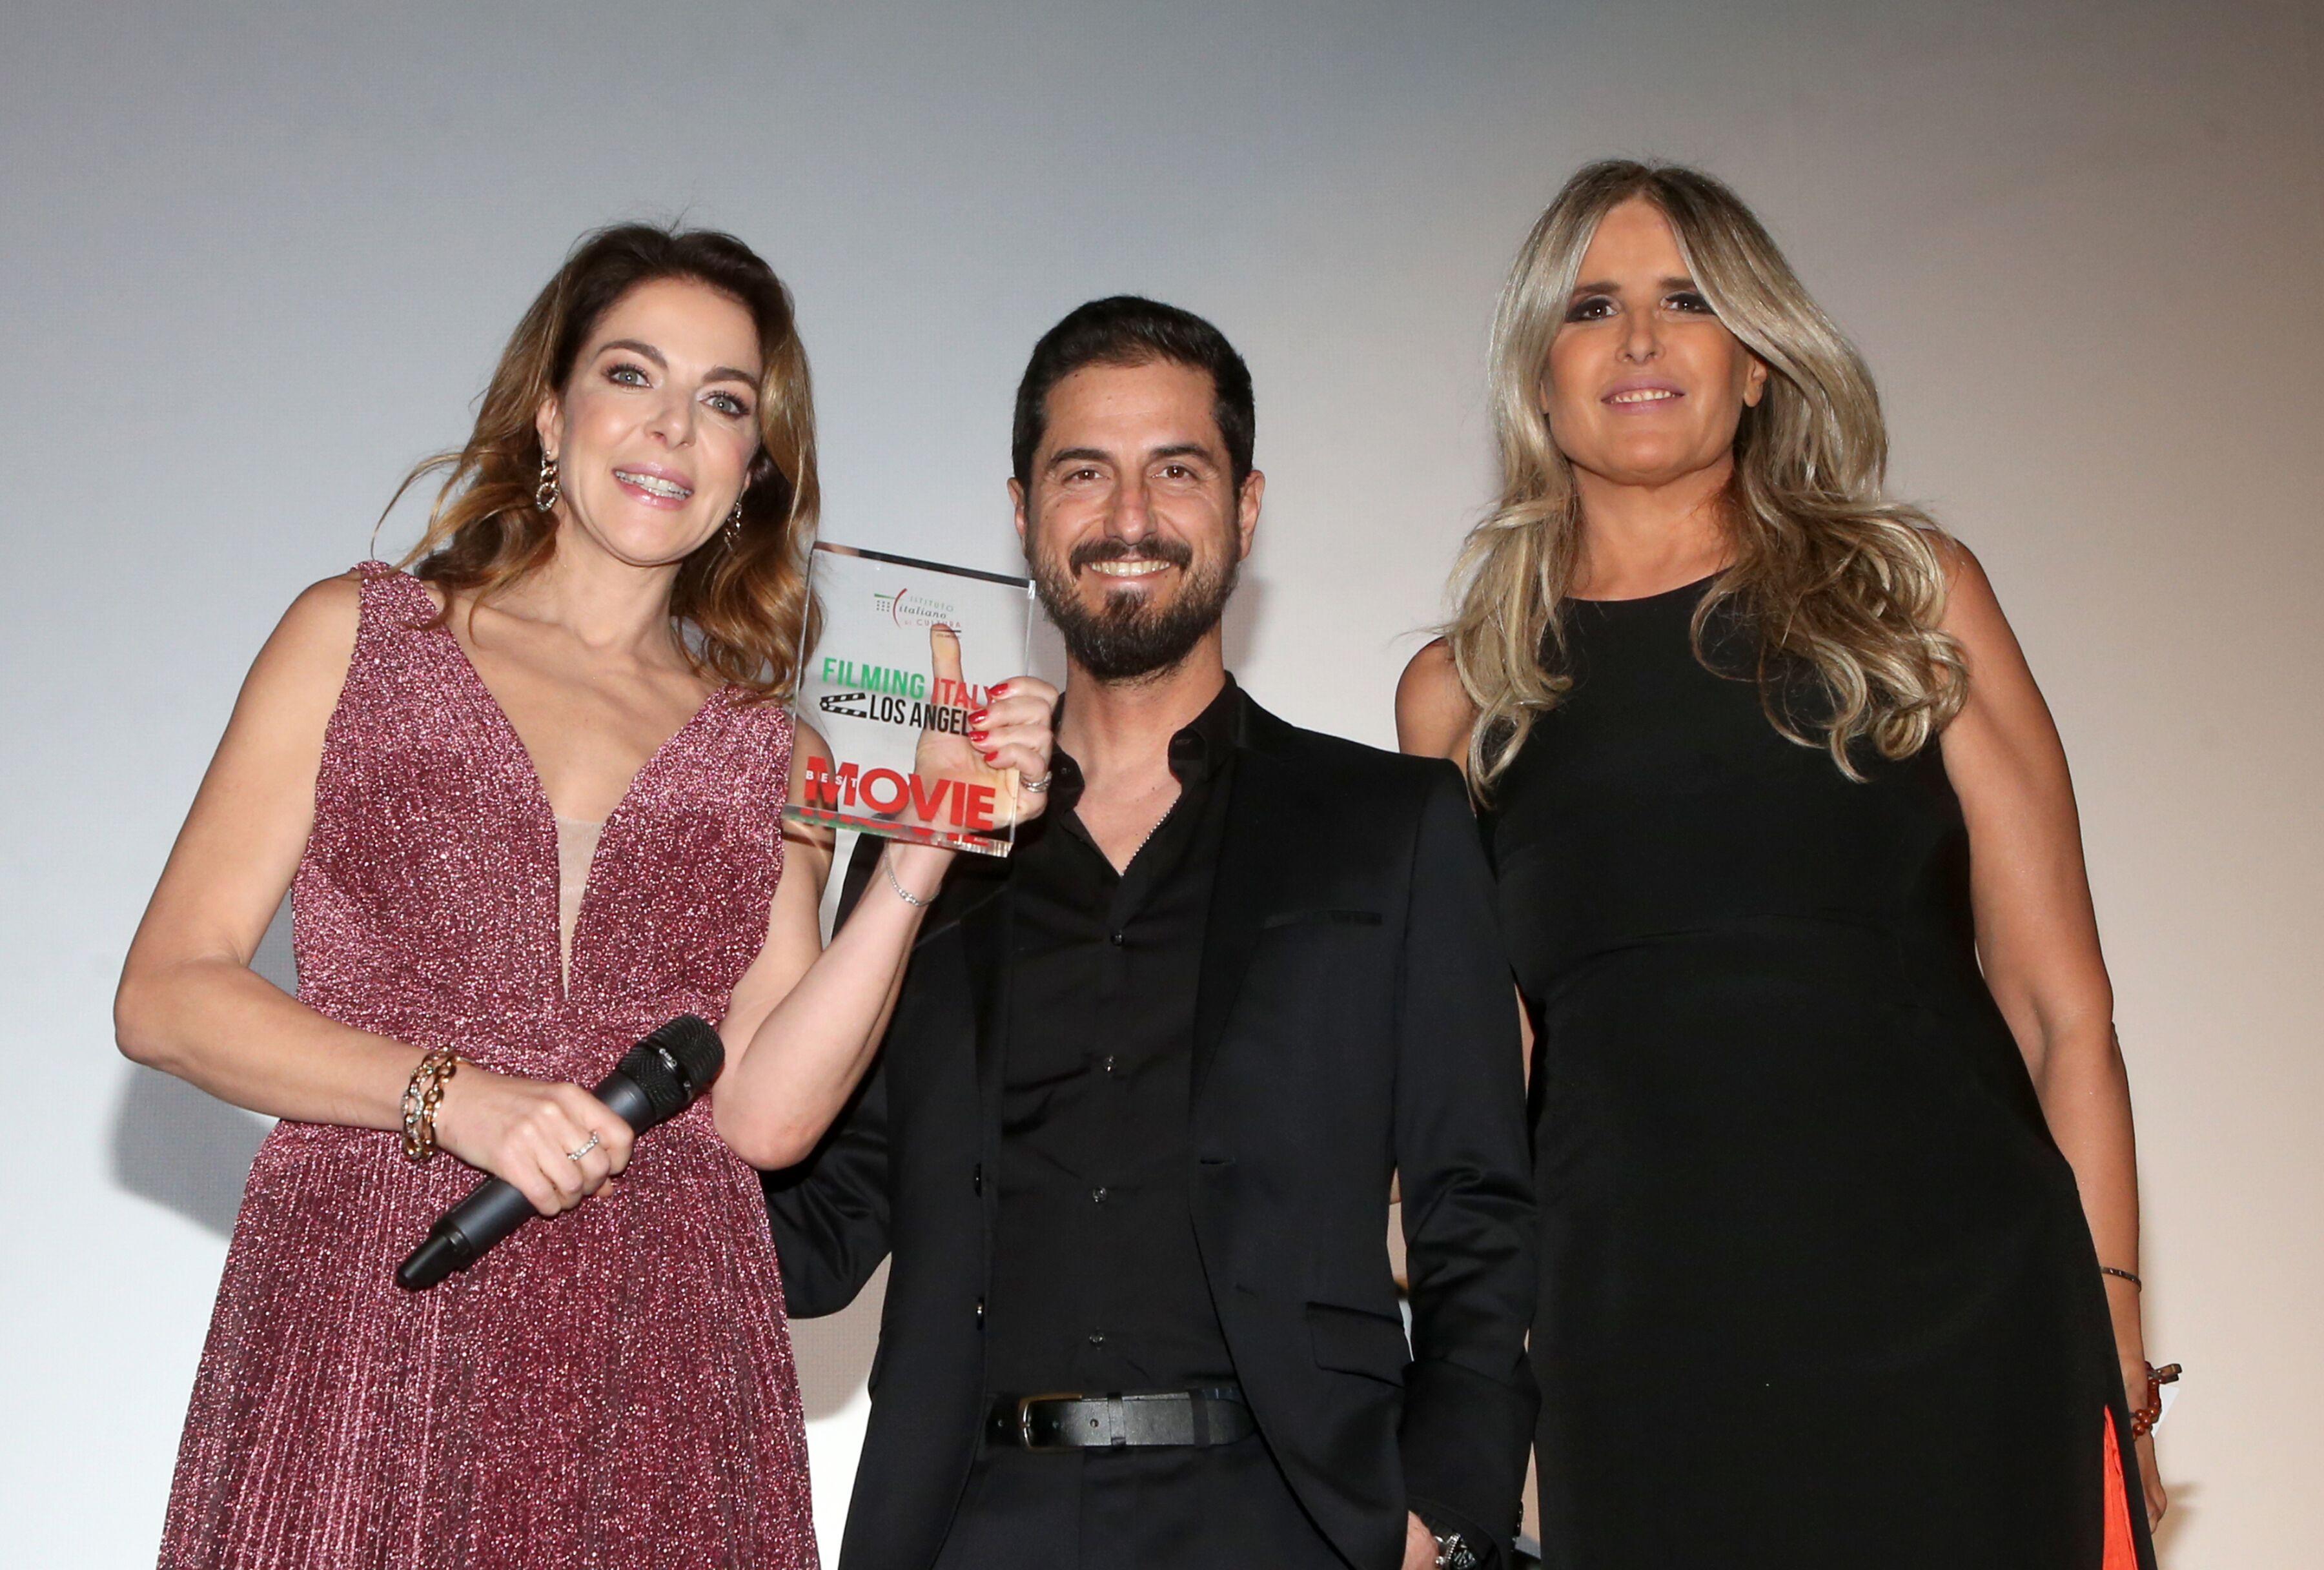 Claudia Gerini, Il direttore di Best Movie Giorgio Via…ingItaly_3